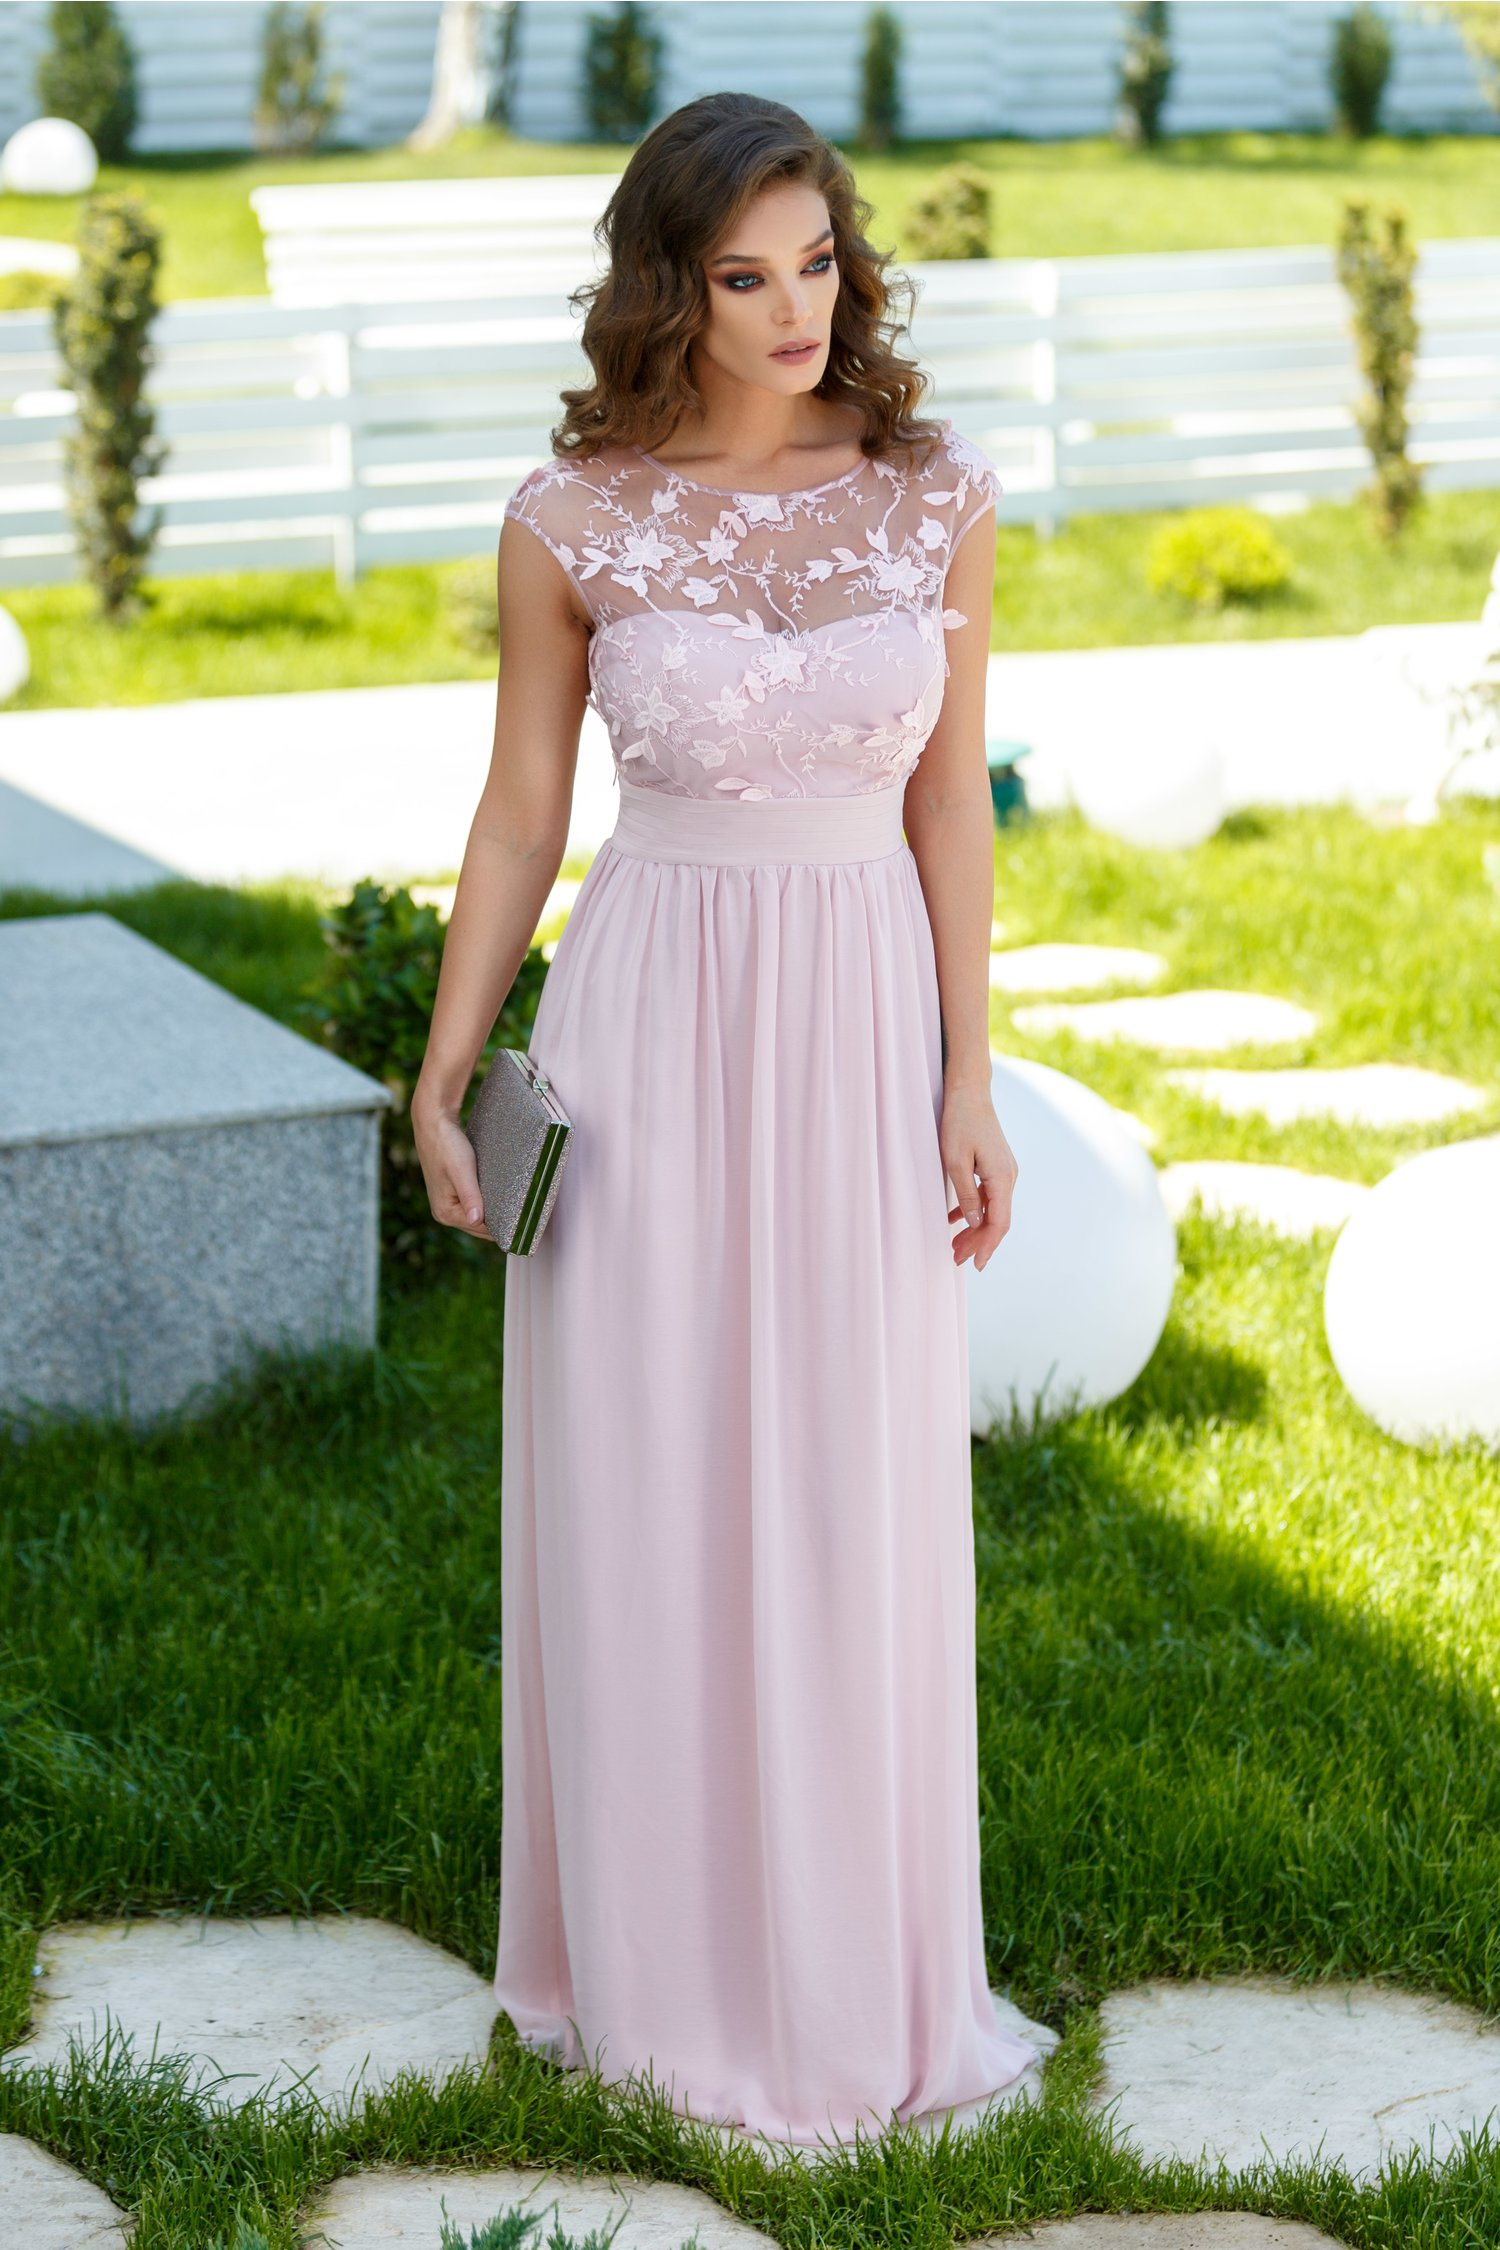 Rochie Sienna roz pudrat lunga cu dantela si broderie la bust